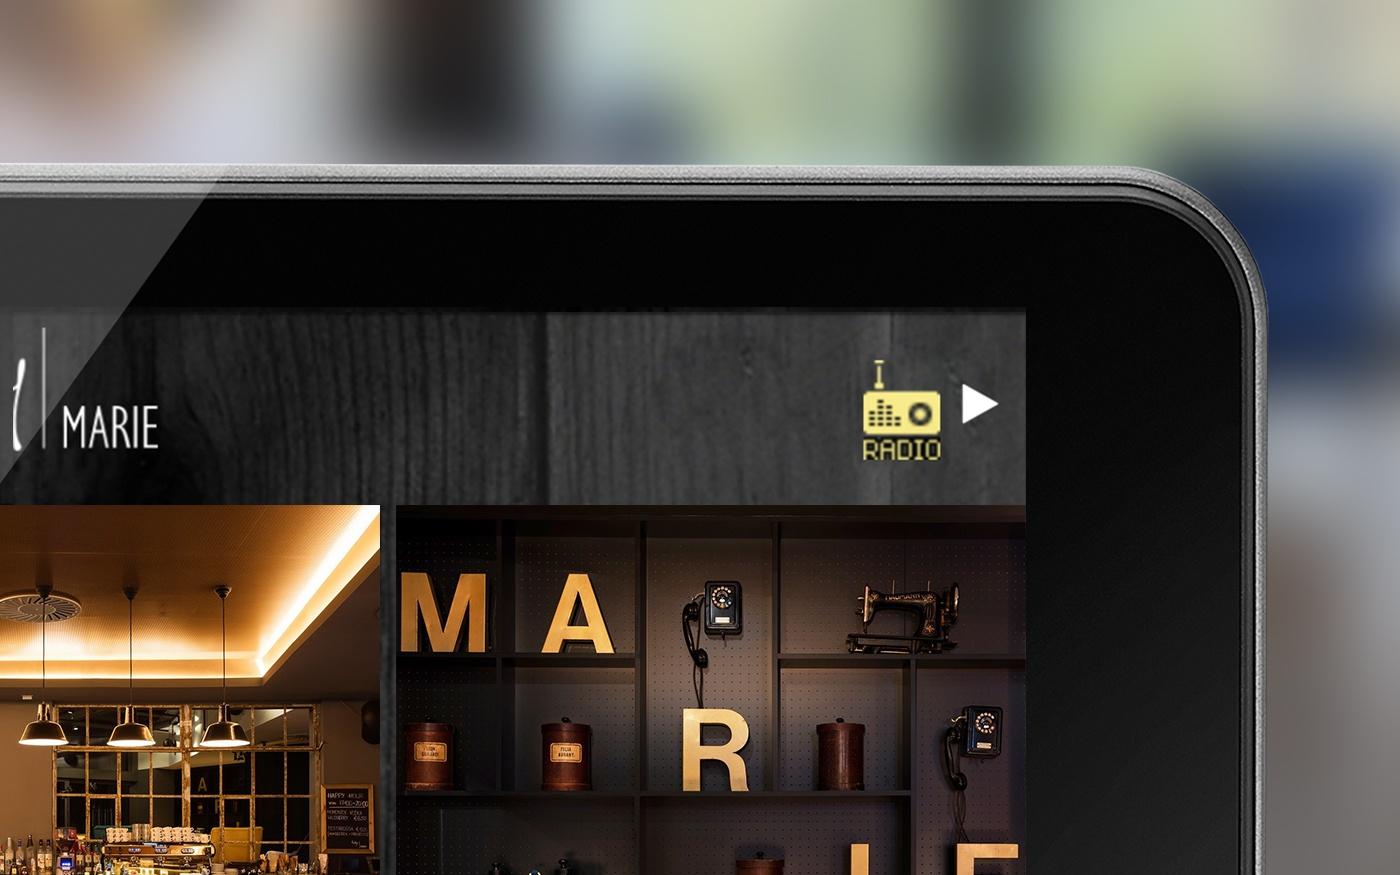 In-Room-Entertainment begeistert Gäste: In den Ruby Hotels begrüßt SuitePad die Gäste mit Musik